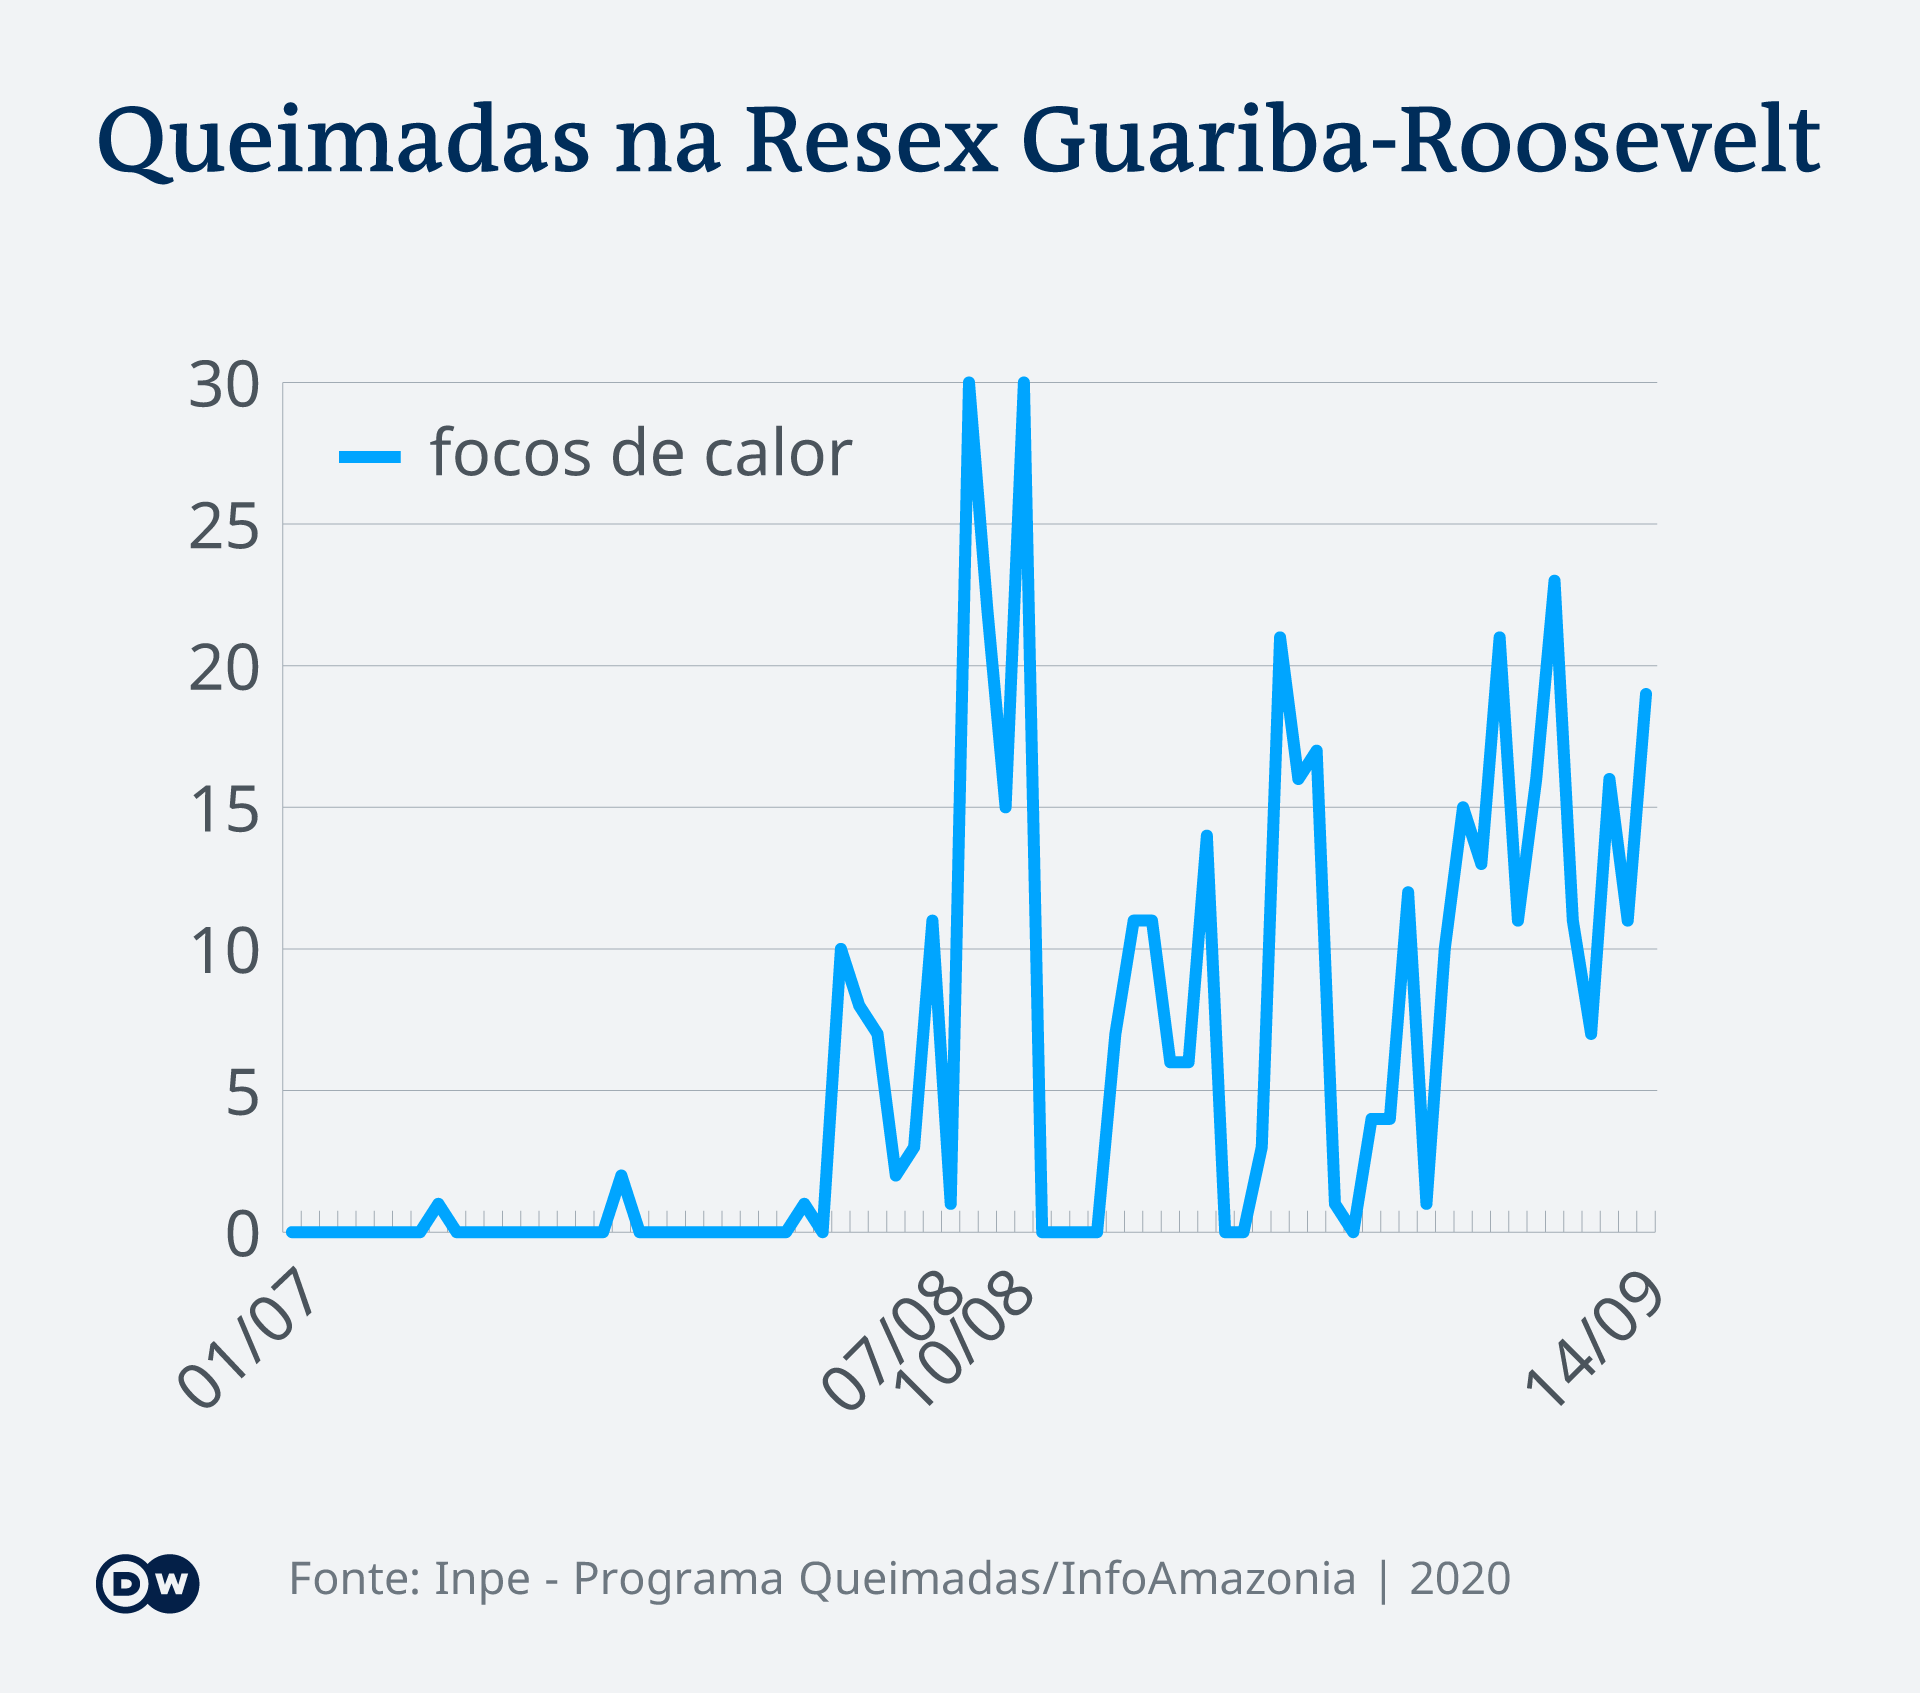 Queimadas na Resex Guariba-Roosevelt